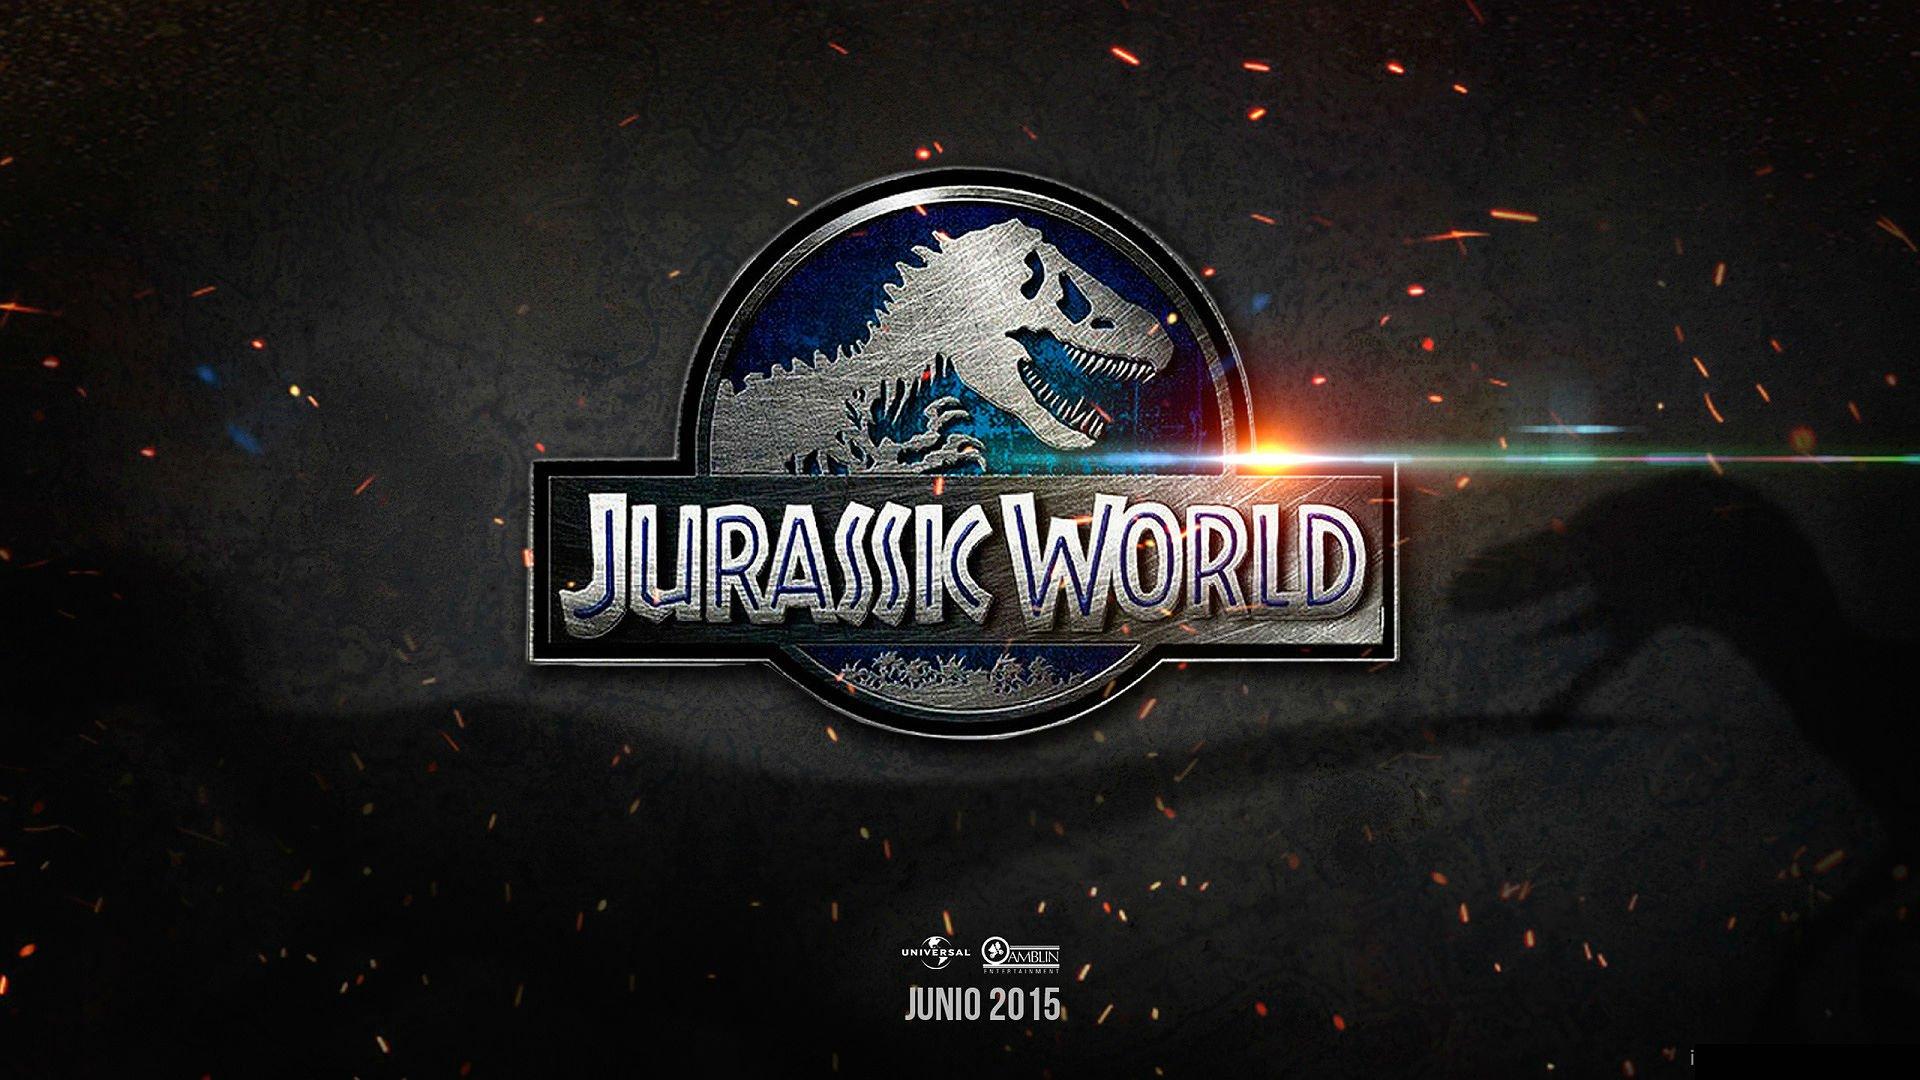 JURASSIC WORLD adventure sci-fi dinosaur action adventure ...